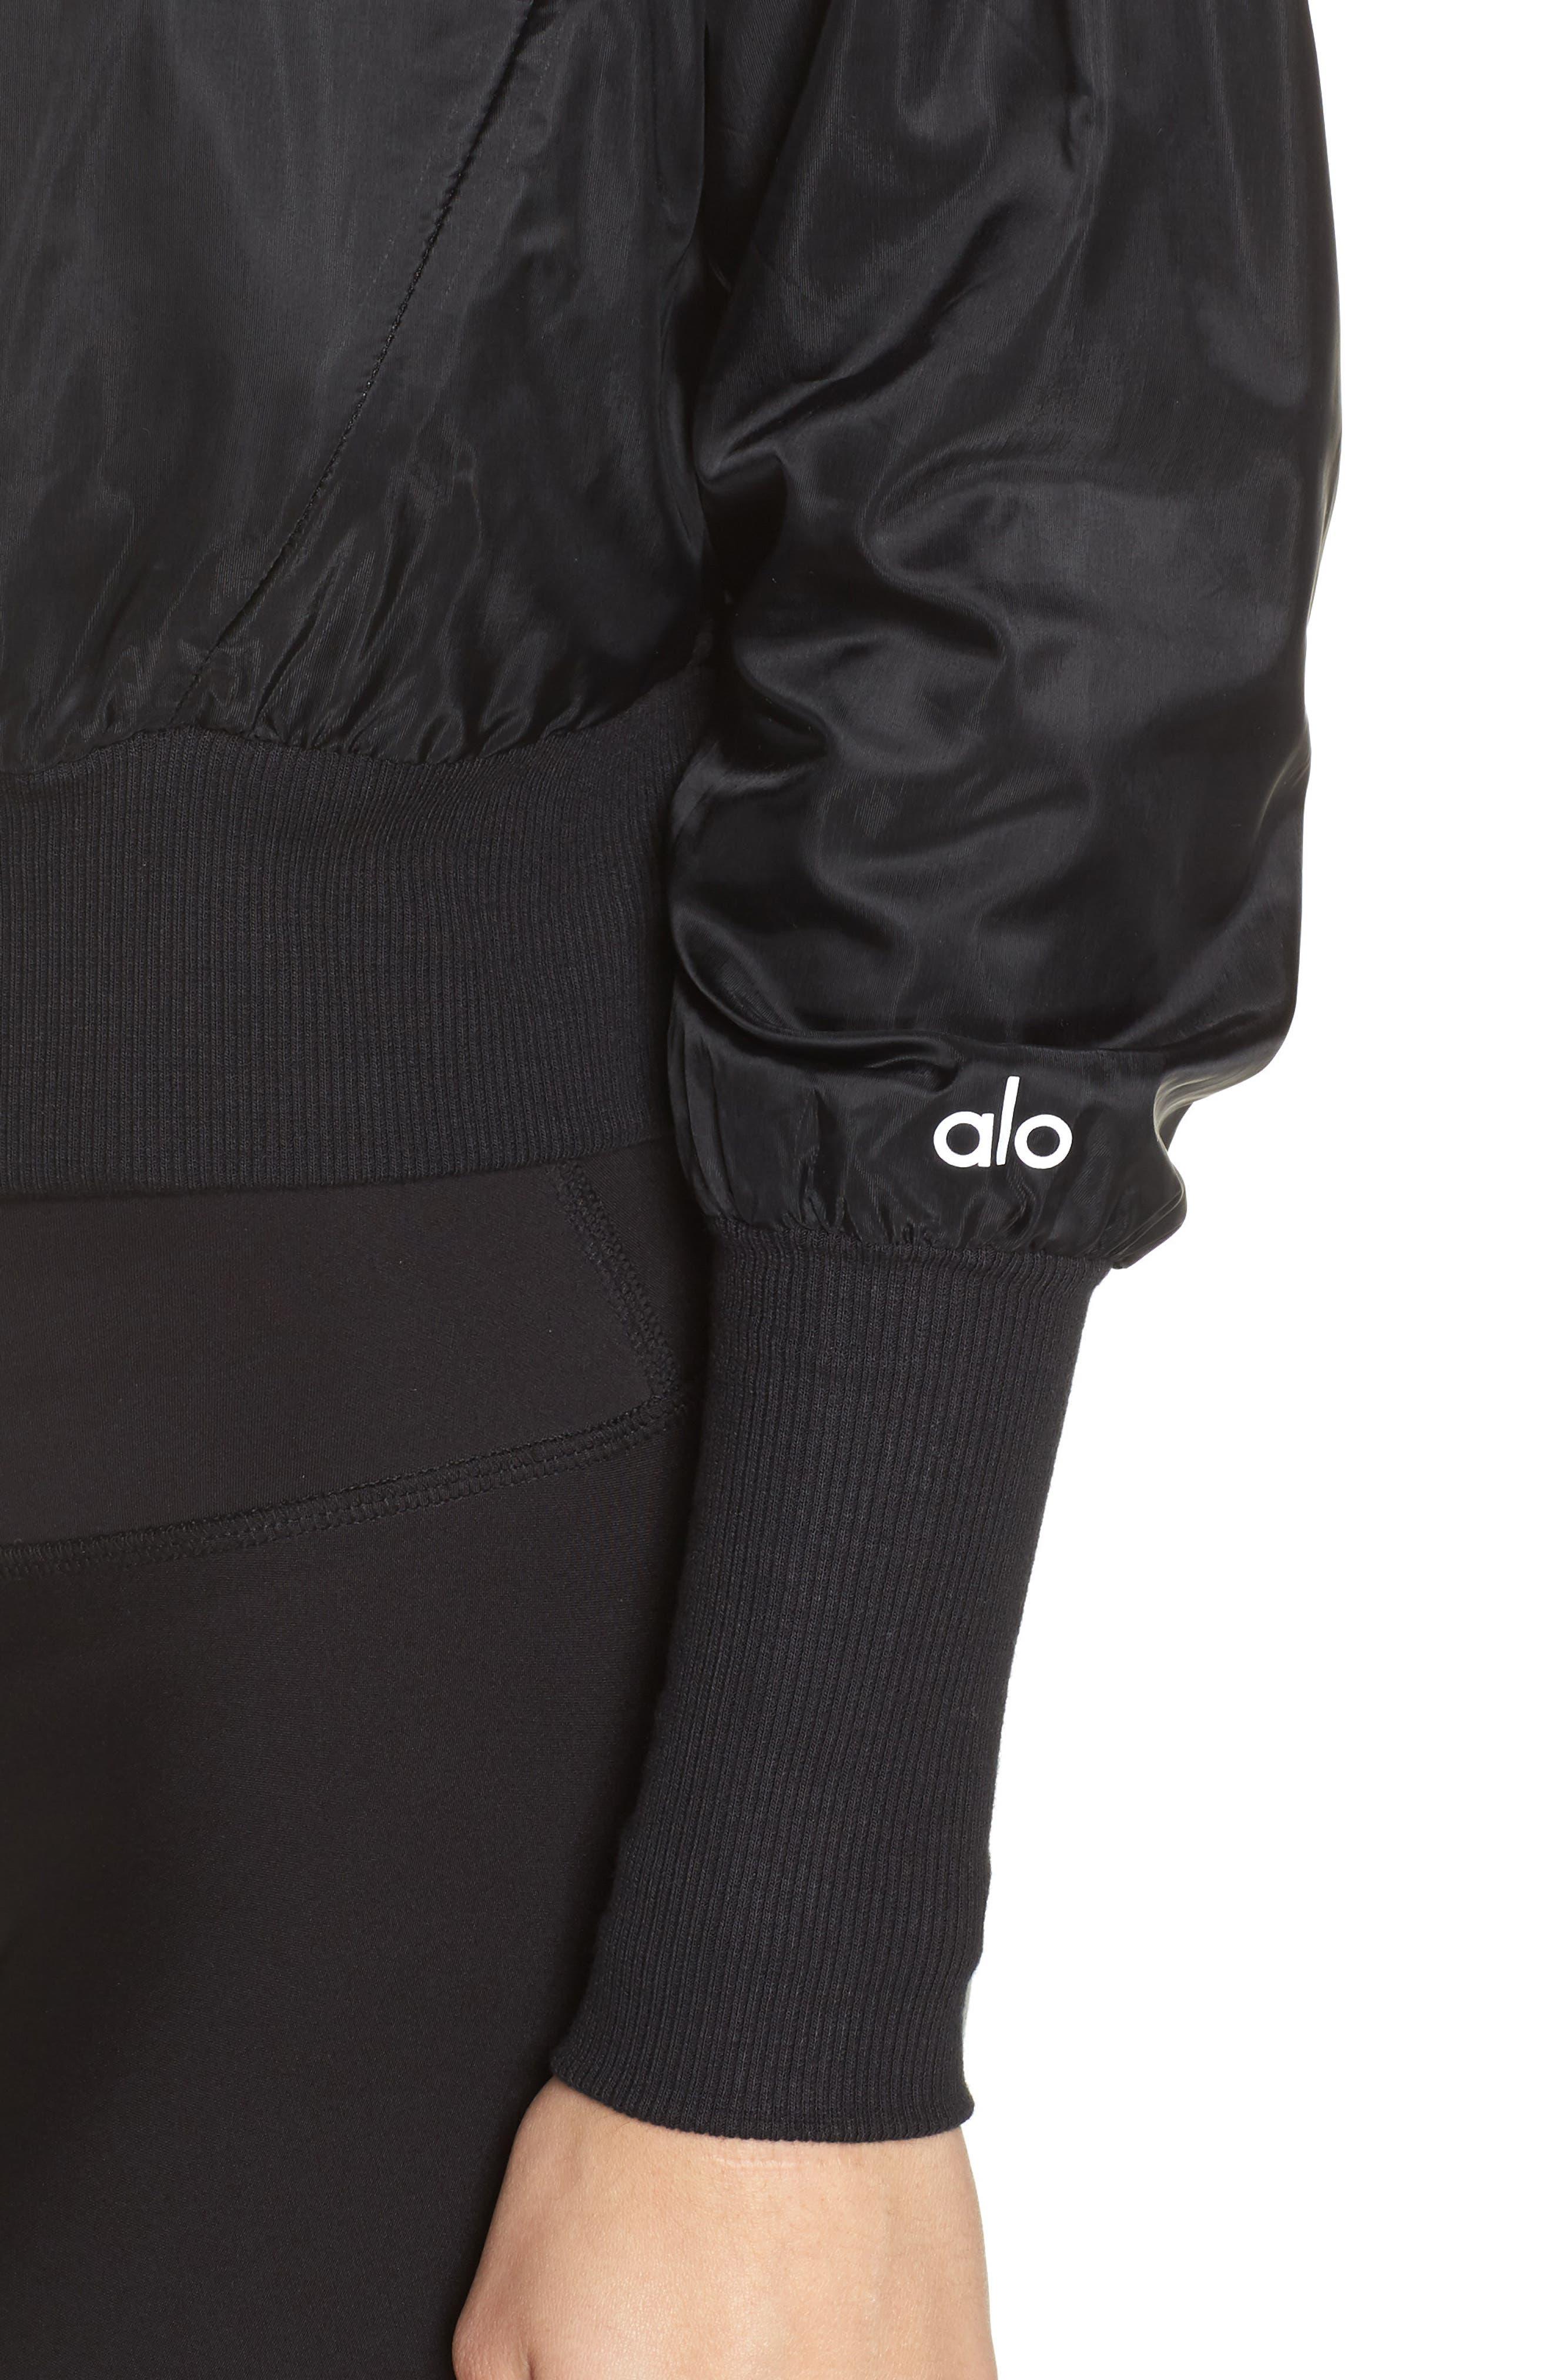 Aqua Jacket,                             Alternate thumbnail 4, color,                             BLACK